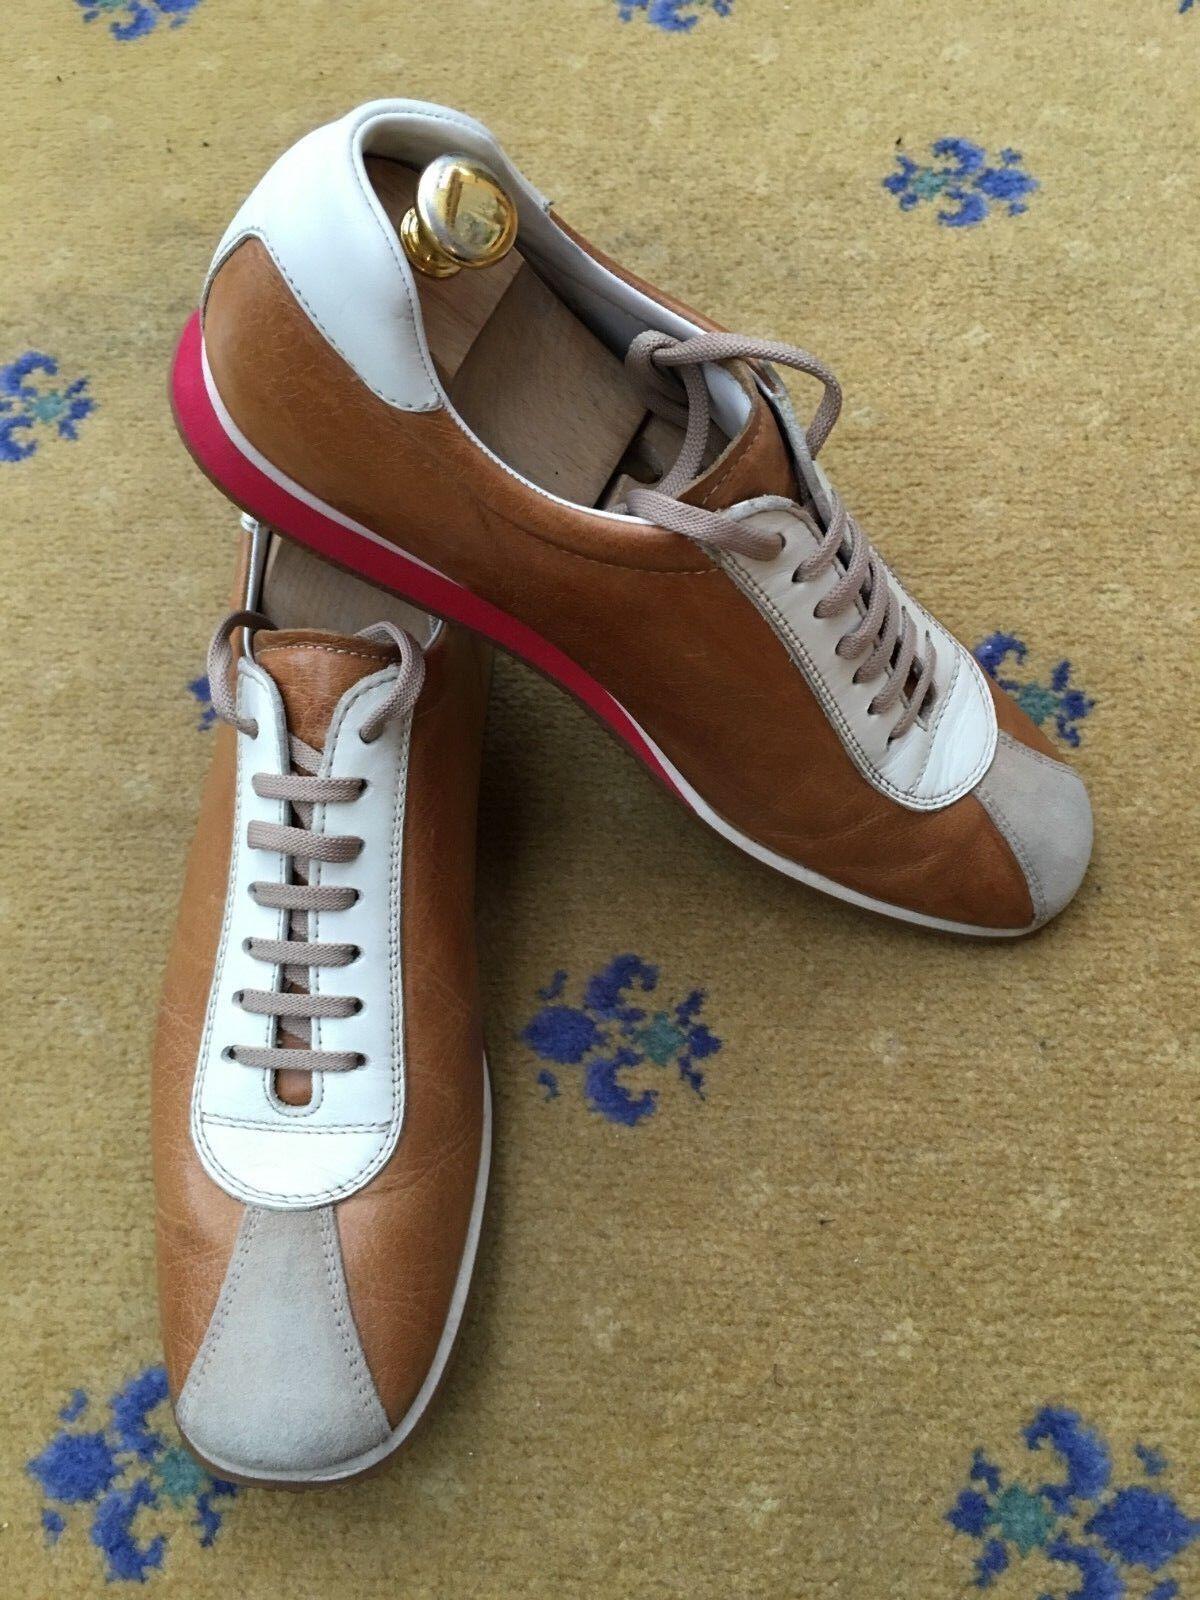 Miu Miu by Prada  Tan  Herren Tan  Braun Leder Trainers Sneakers Schuhes UK 9 US 10 EU 43 ec234a